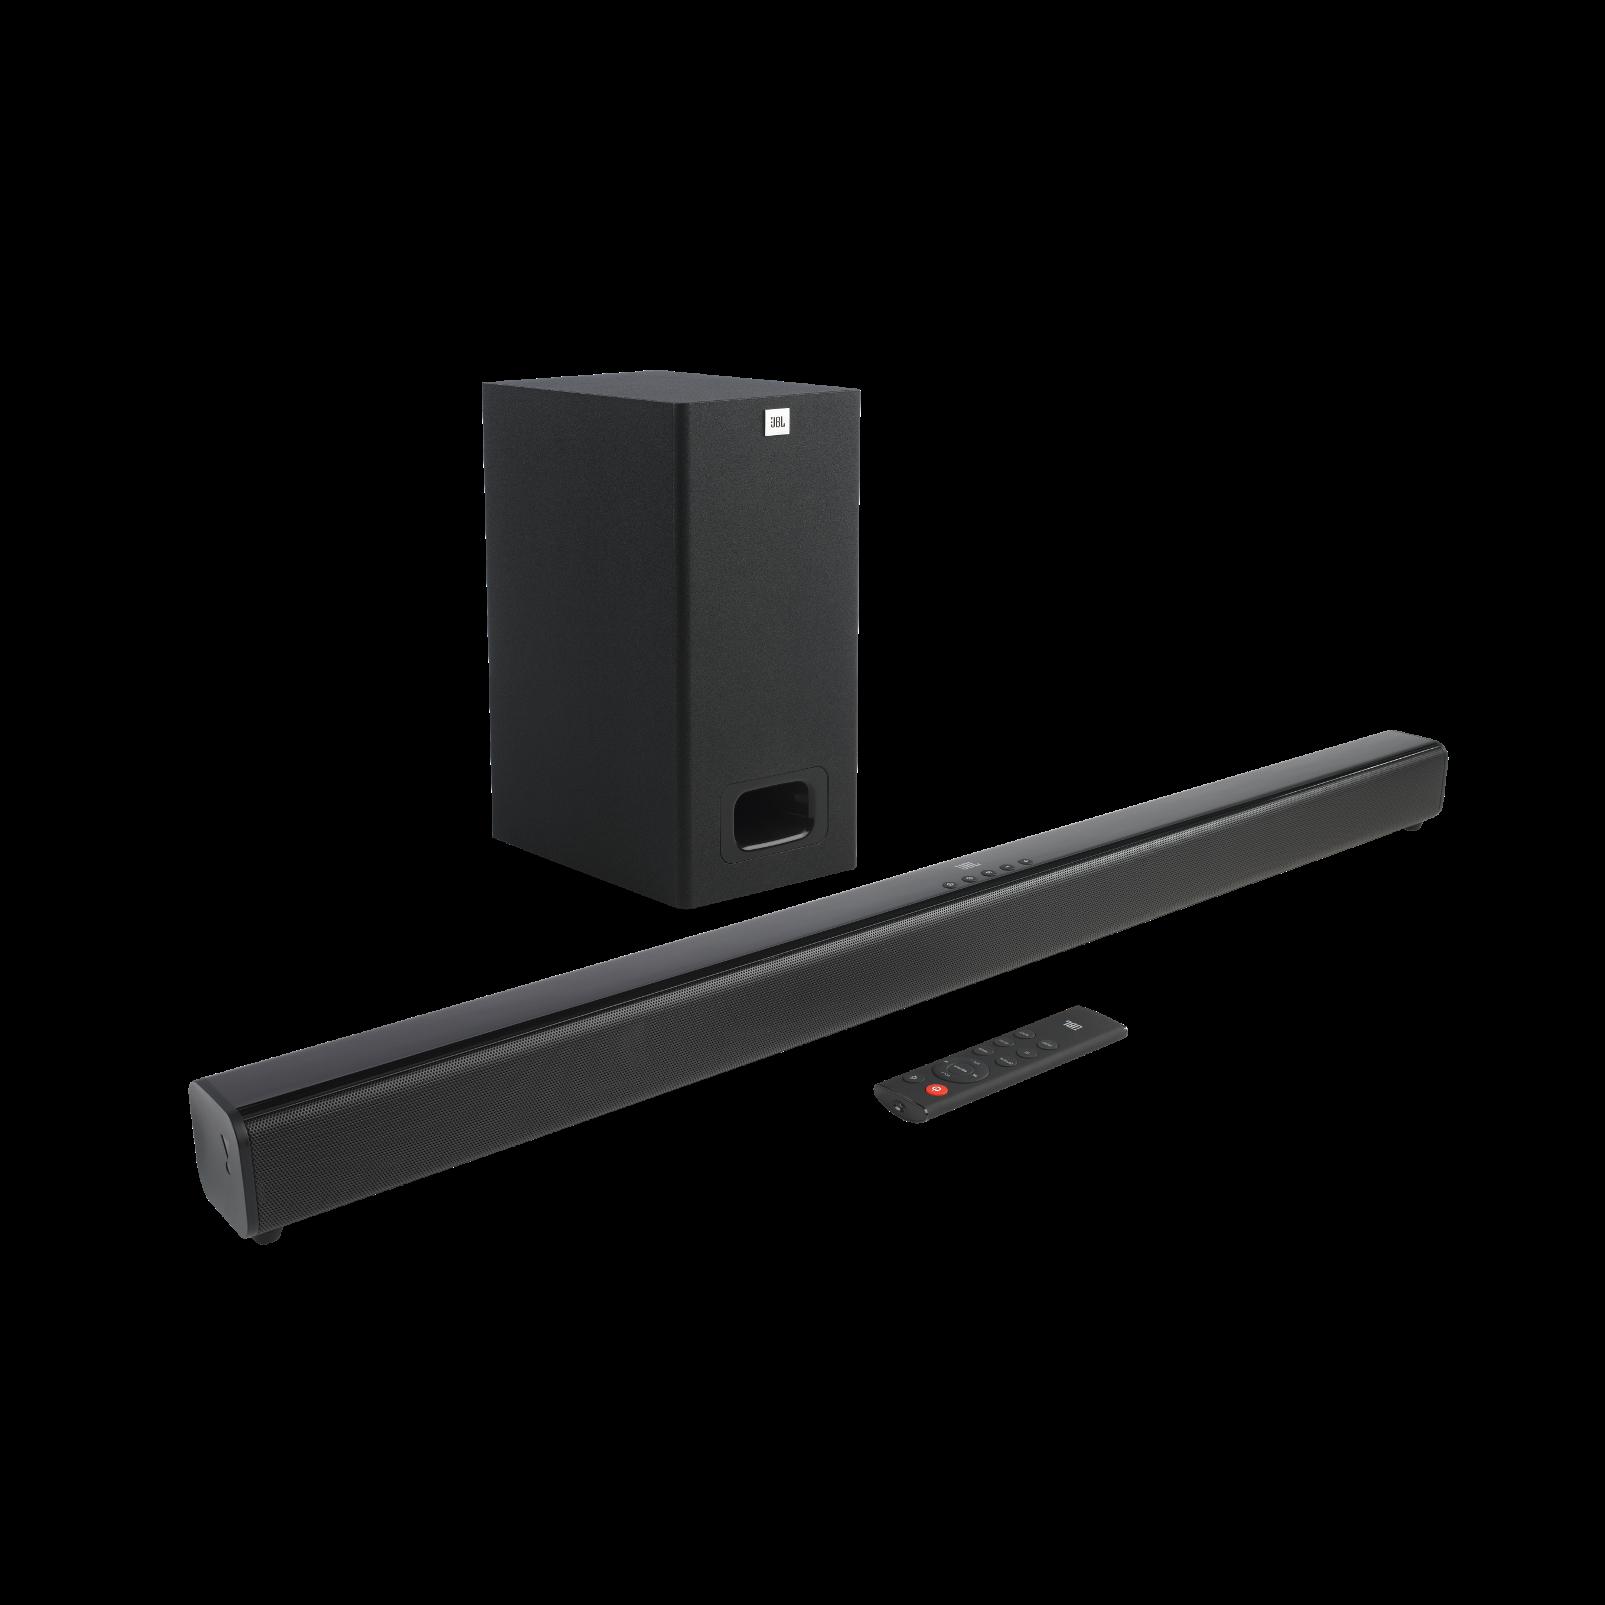 JBL Cinema SB231 - Black - 2.1 Channel Soundbar with Wired Subwoofer - Hero